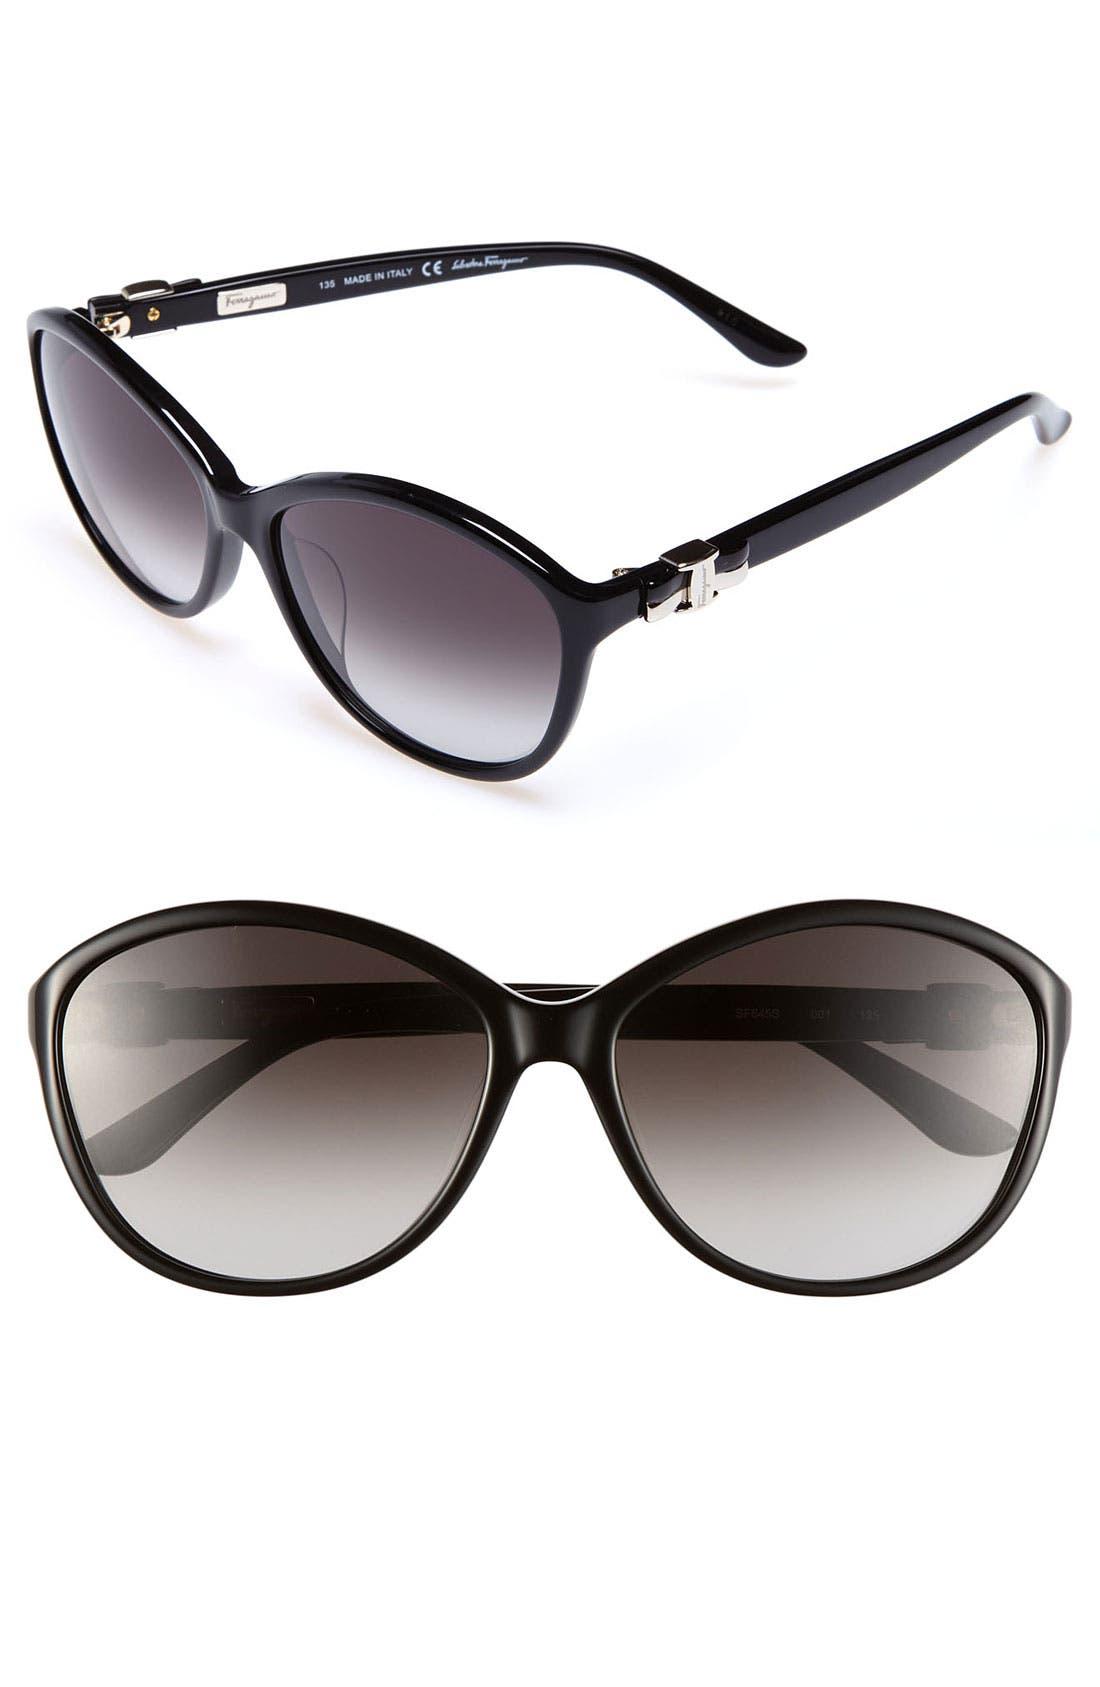 Main Image - Salvatore Ferragamo 58mm Oversized Sunglasses